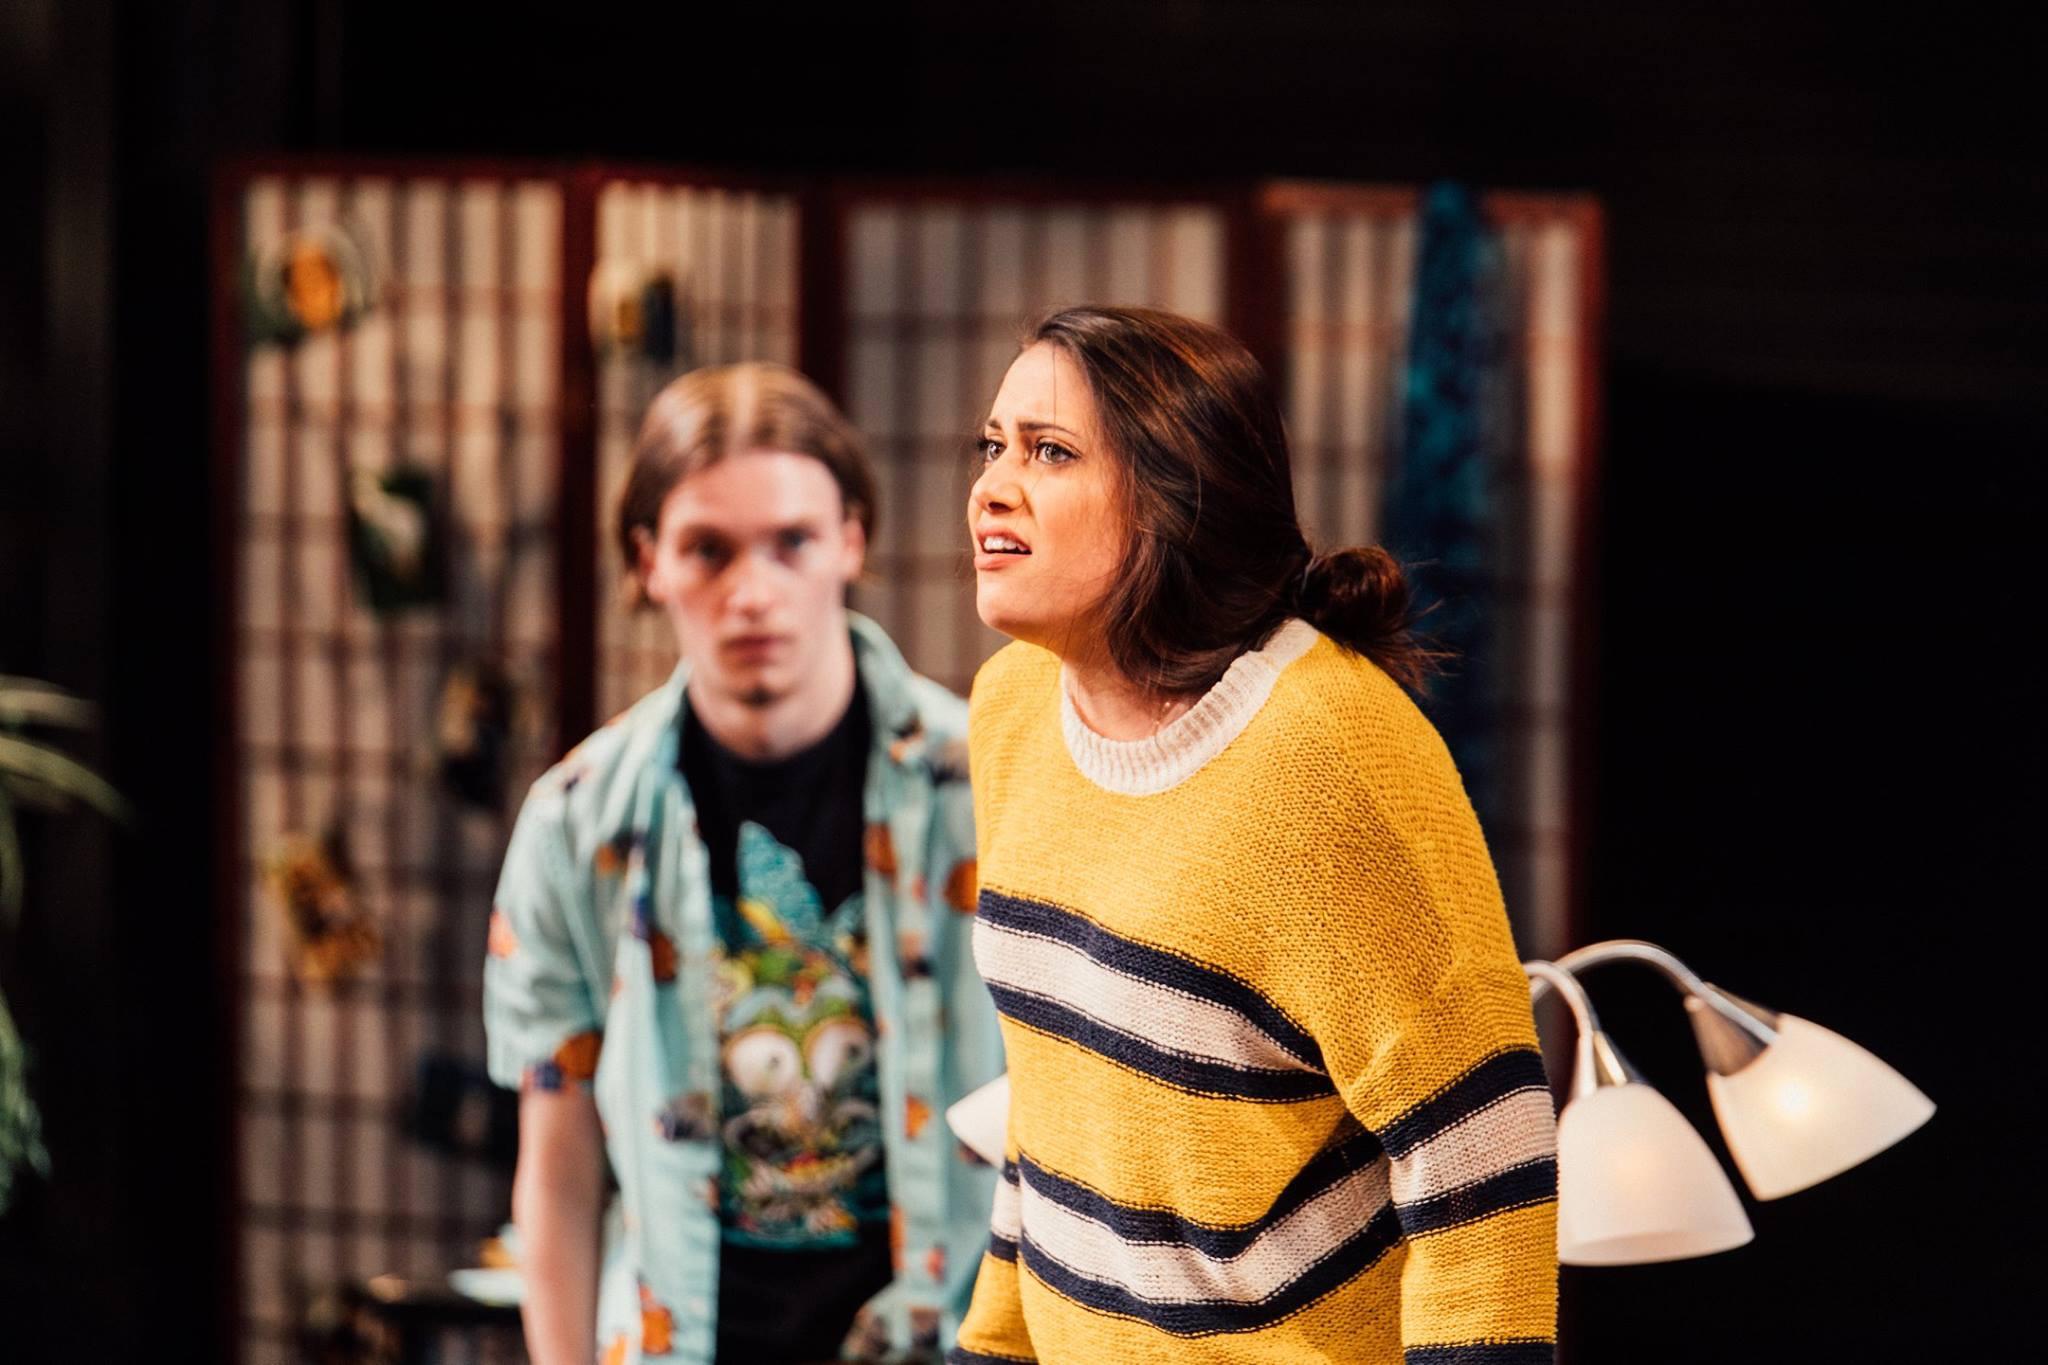 Dissasembly  By Steven Christopher Yockey  Atlantic Acting School, 2019  PC: Marzio Fulfaro